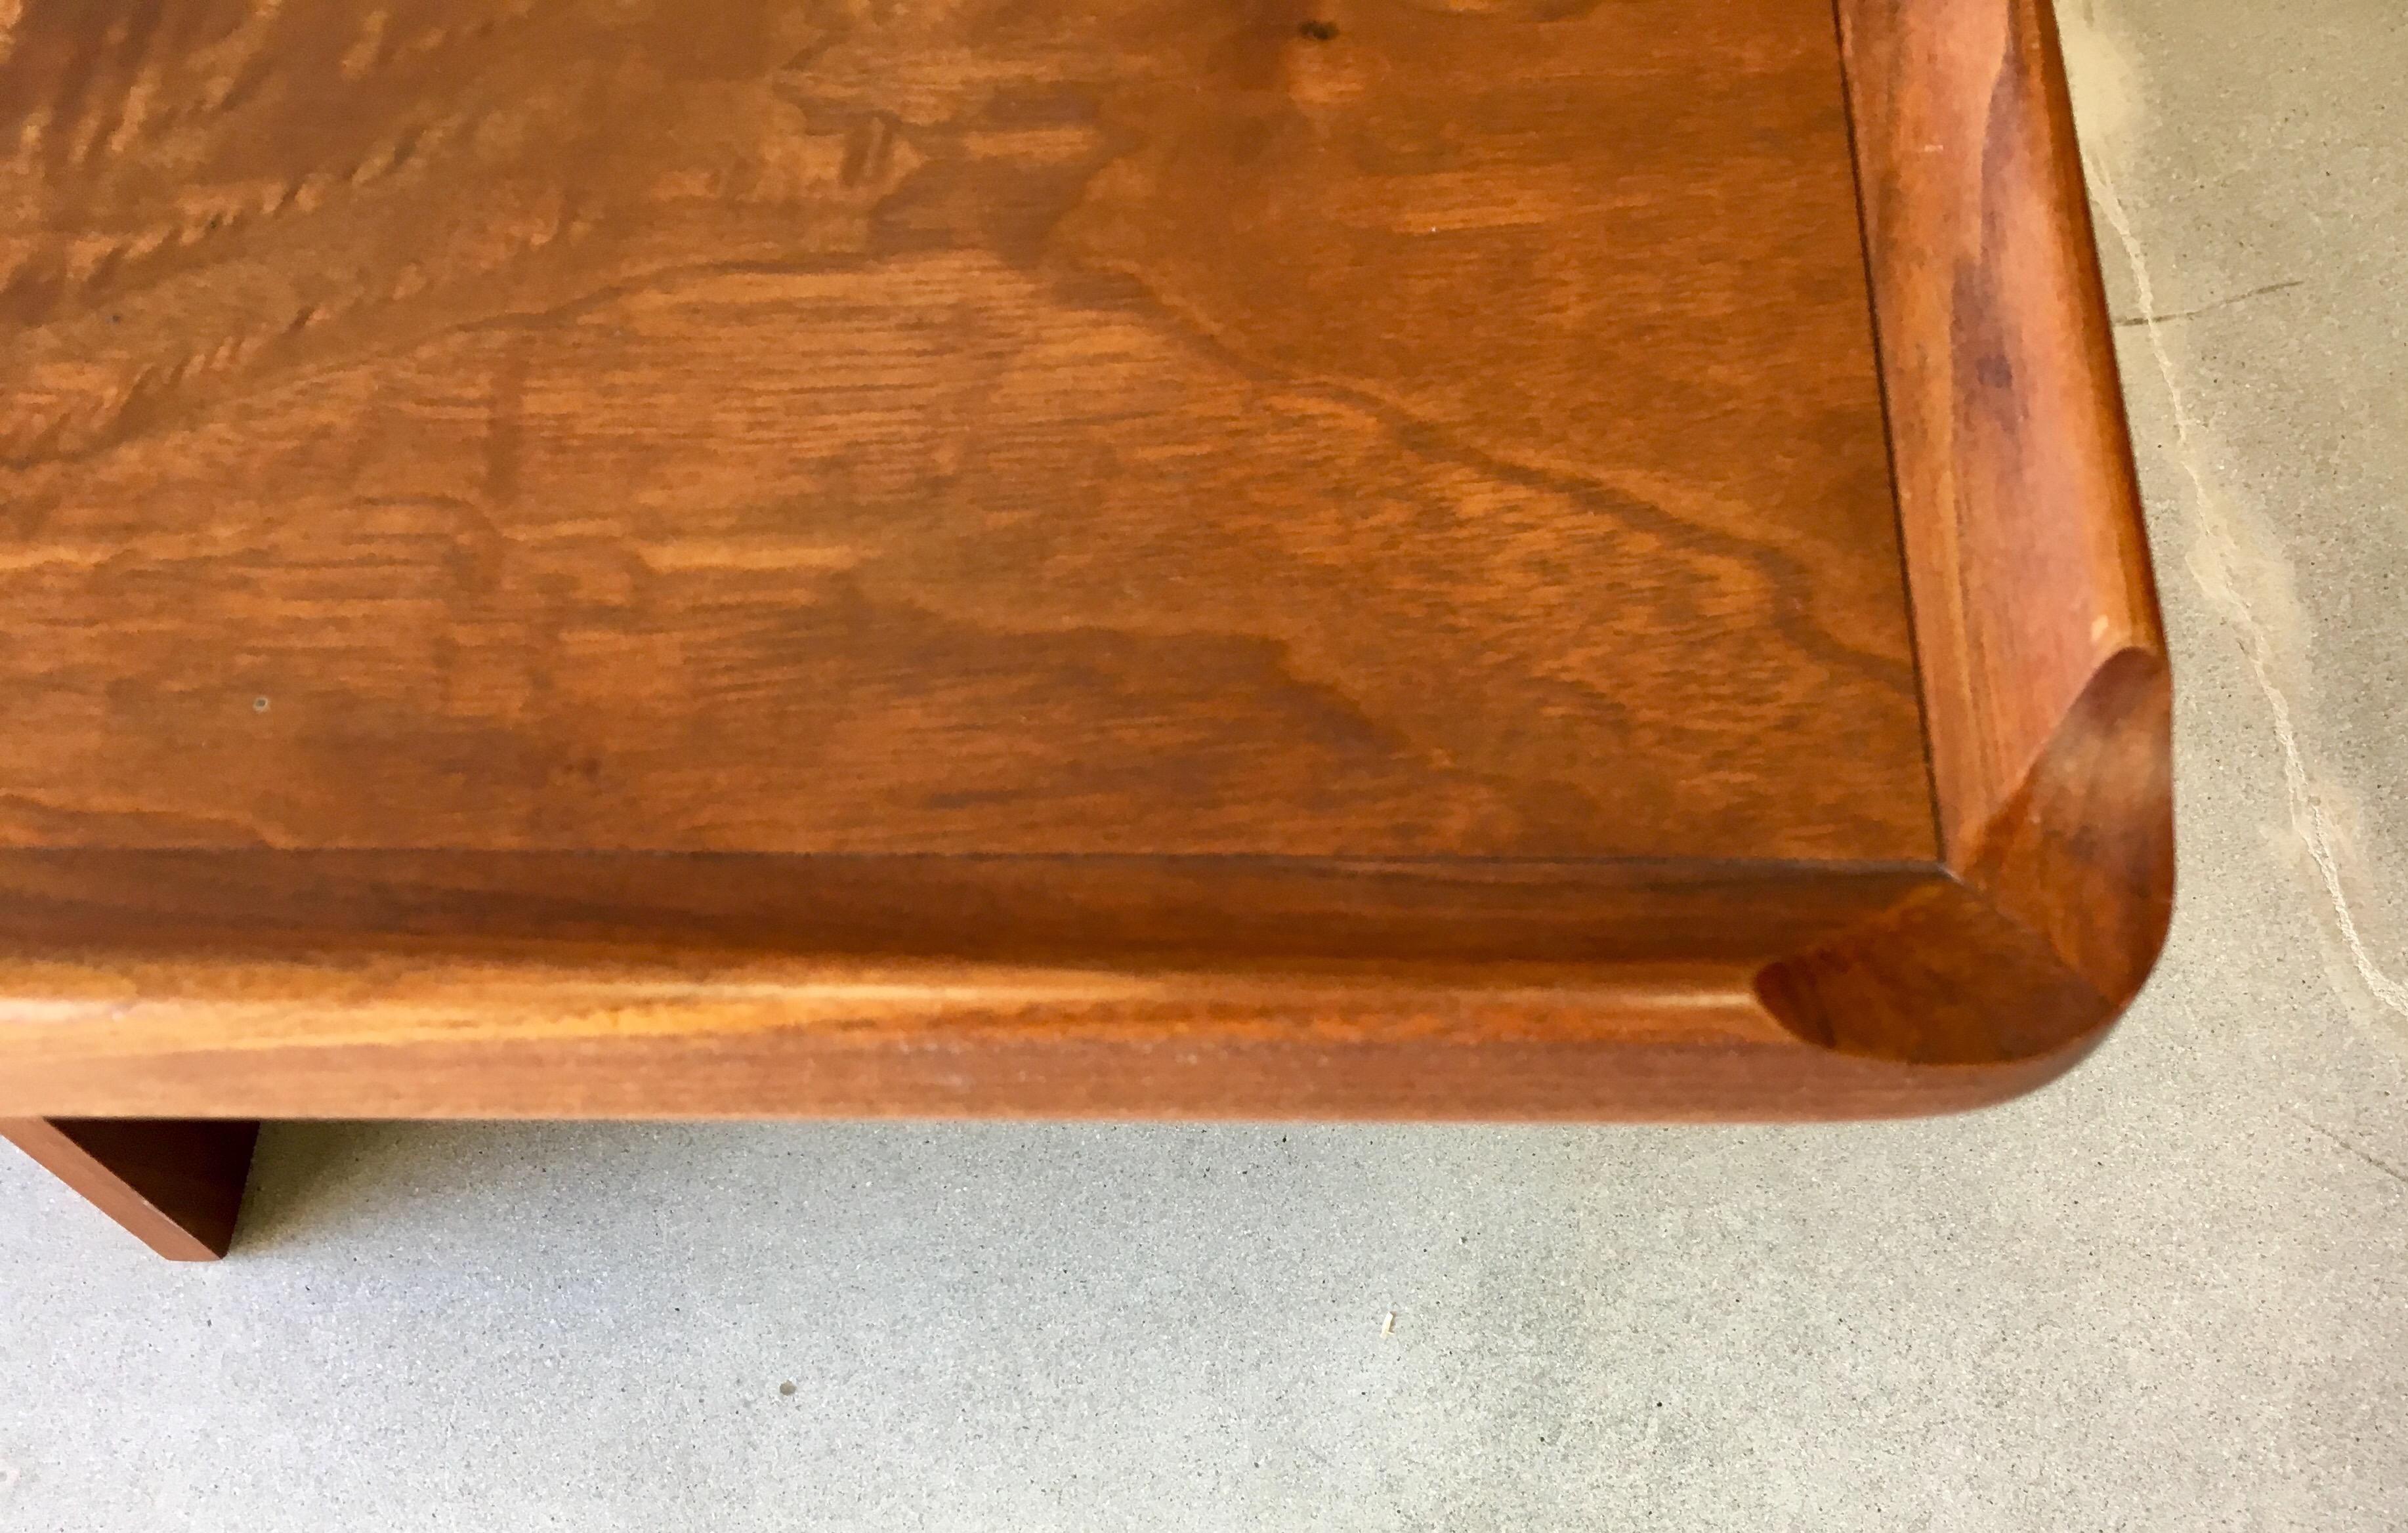 Attrayant Brown Saltman Furniture History #3   Brown Saltman Mid Century Coffee U0026  Nesting Tables   5 Pieces   Image 4 Of